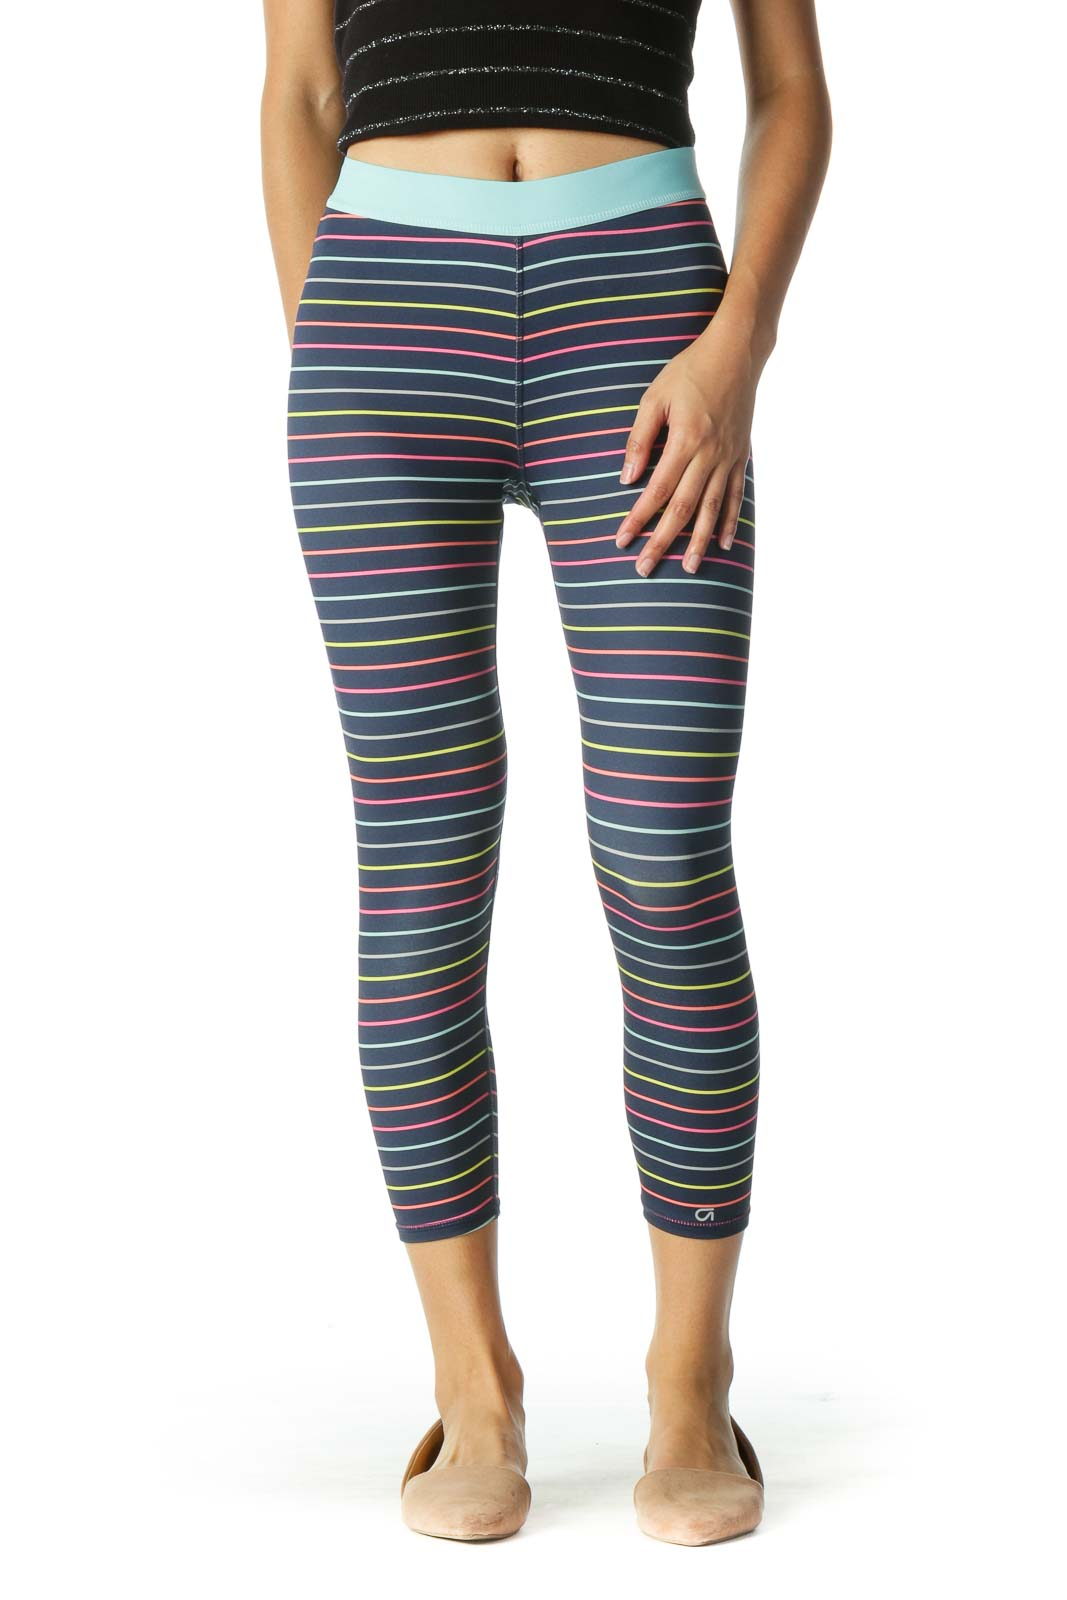 Blue Multicolor Striped Leggings